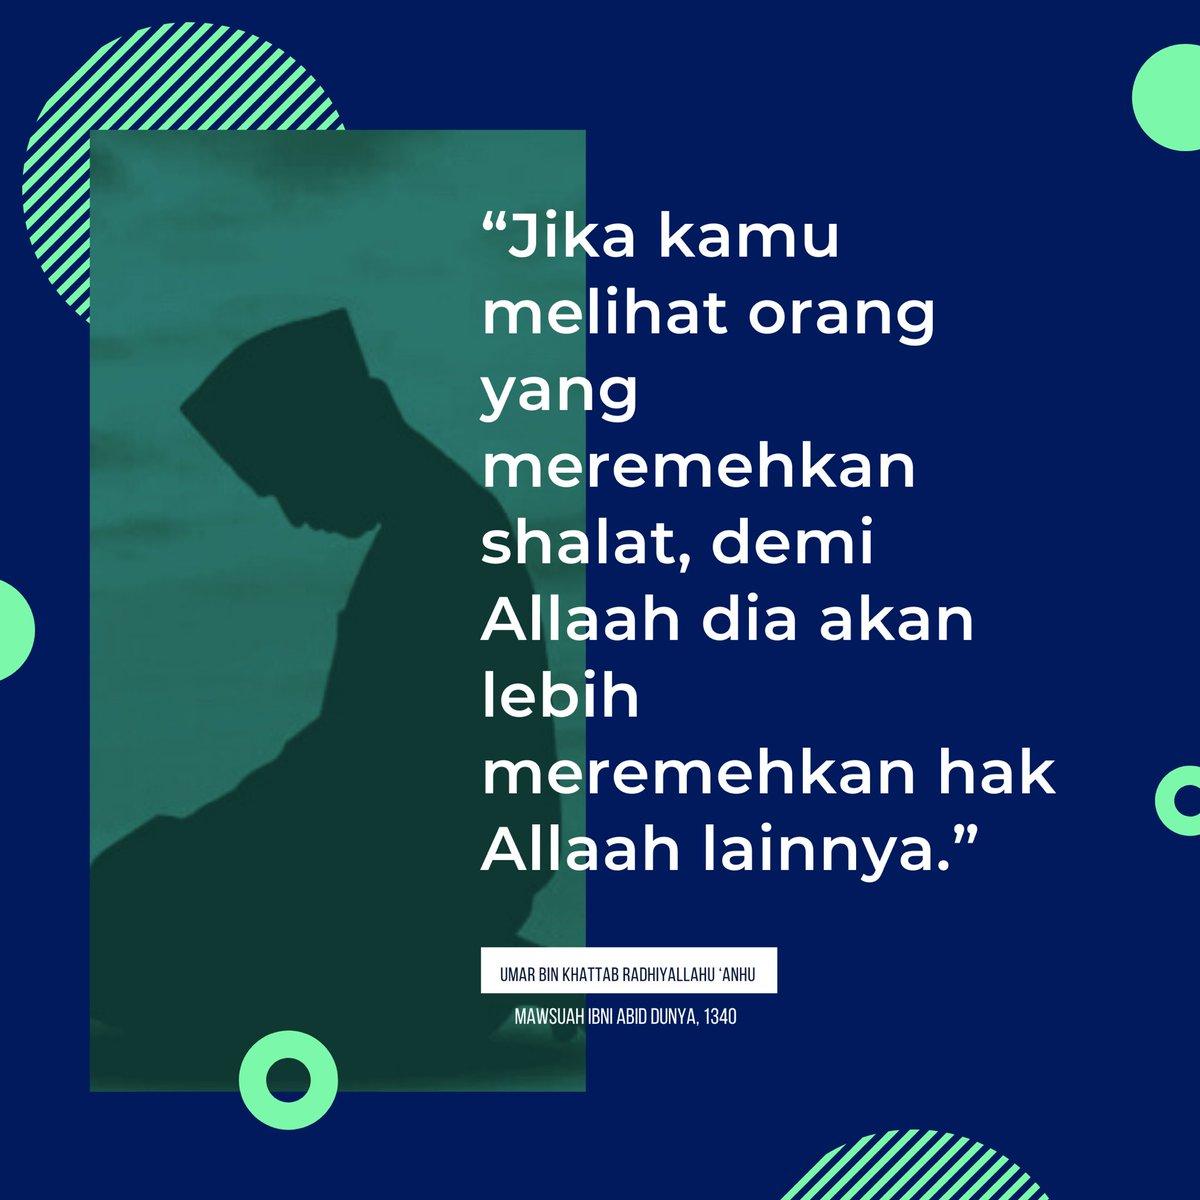 #tauhid #aqidah #hijrah #islam #doa #hadits #alquran #sholat #fiqh #sunnah #quoteoftheday #dakwah #majelistaklim #tafsirquran #istiqomahpic.twitter.com/l7rXuFLlRb